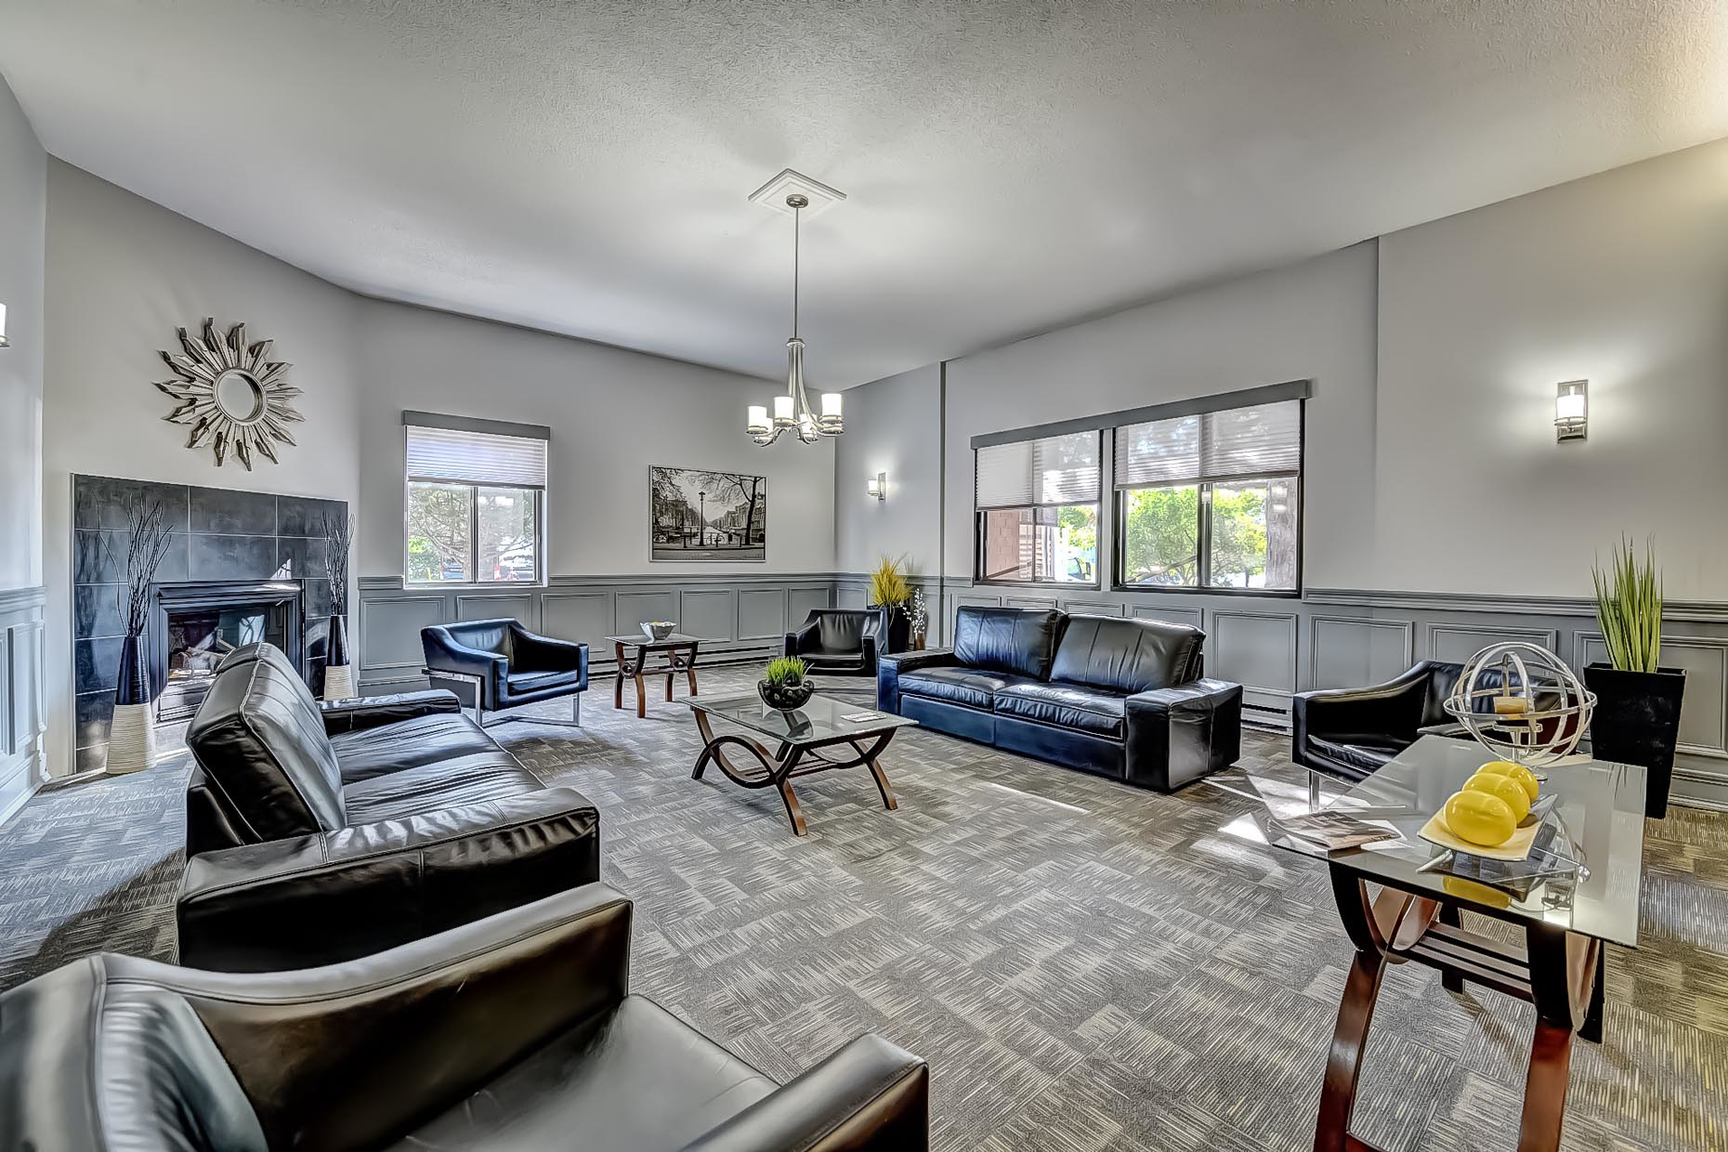 1 bedroom Apartments for rent in Laval at Le Quatre Cent - Photo 23 - RentQuebecApartments – L407184